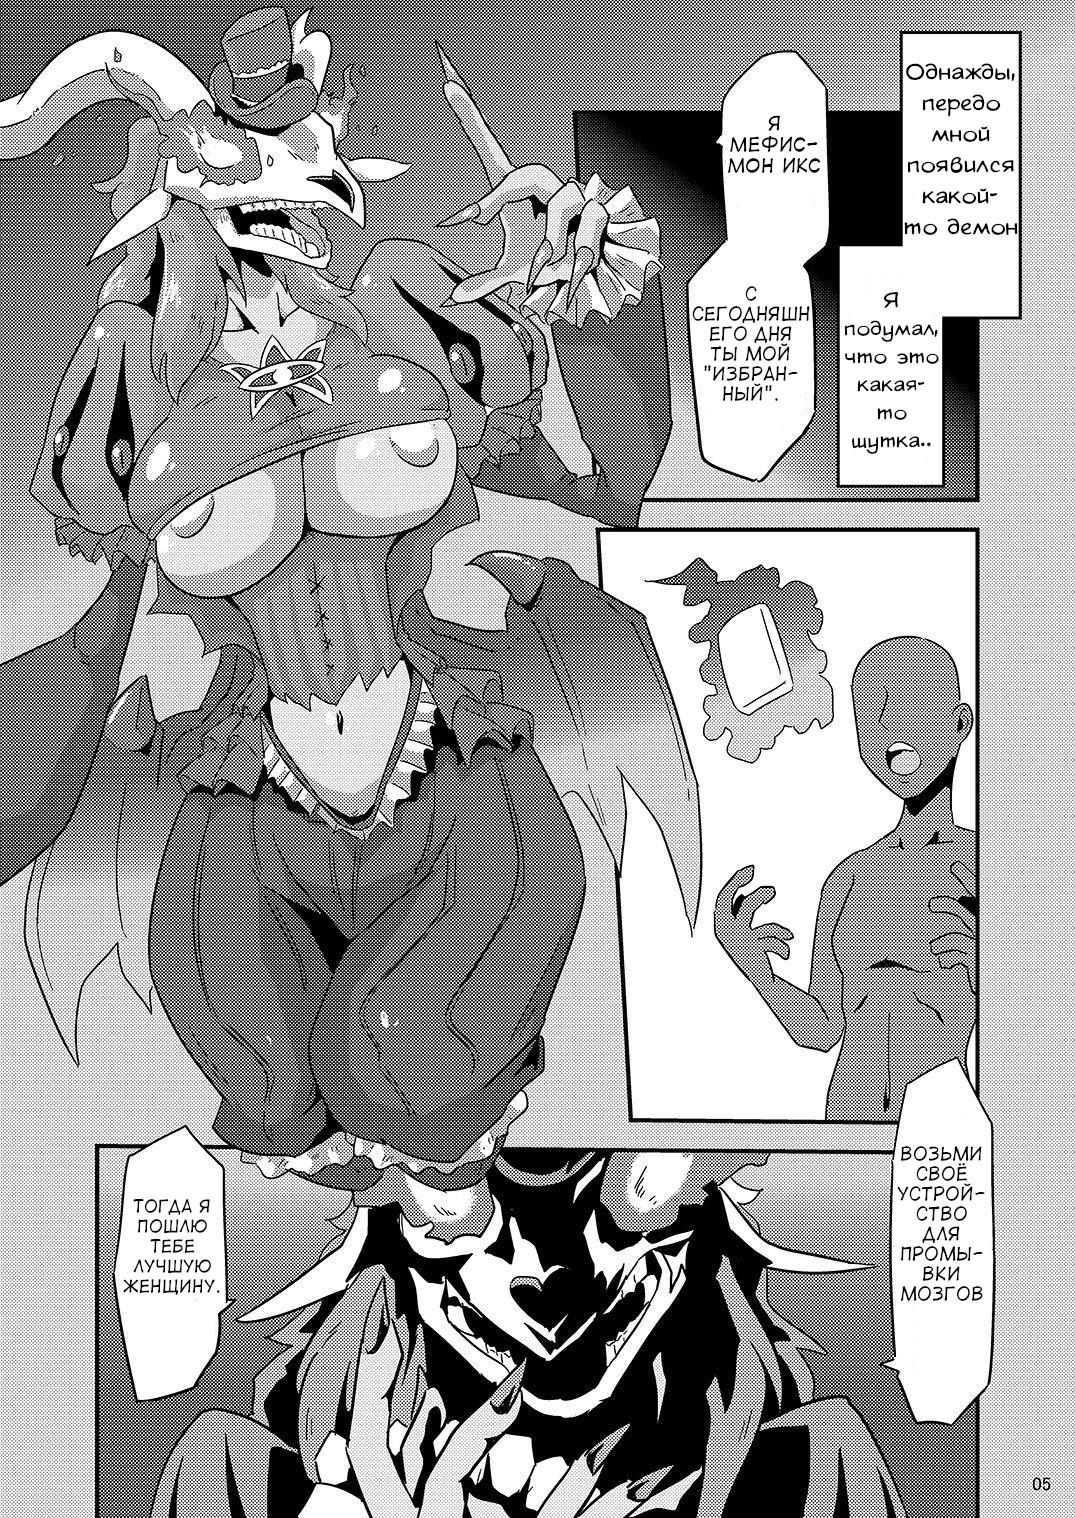 Digital Brainwash Program (Russian) - page05 Digimon Adventure,  xxx porn rule34